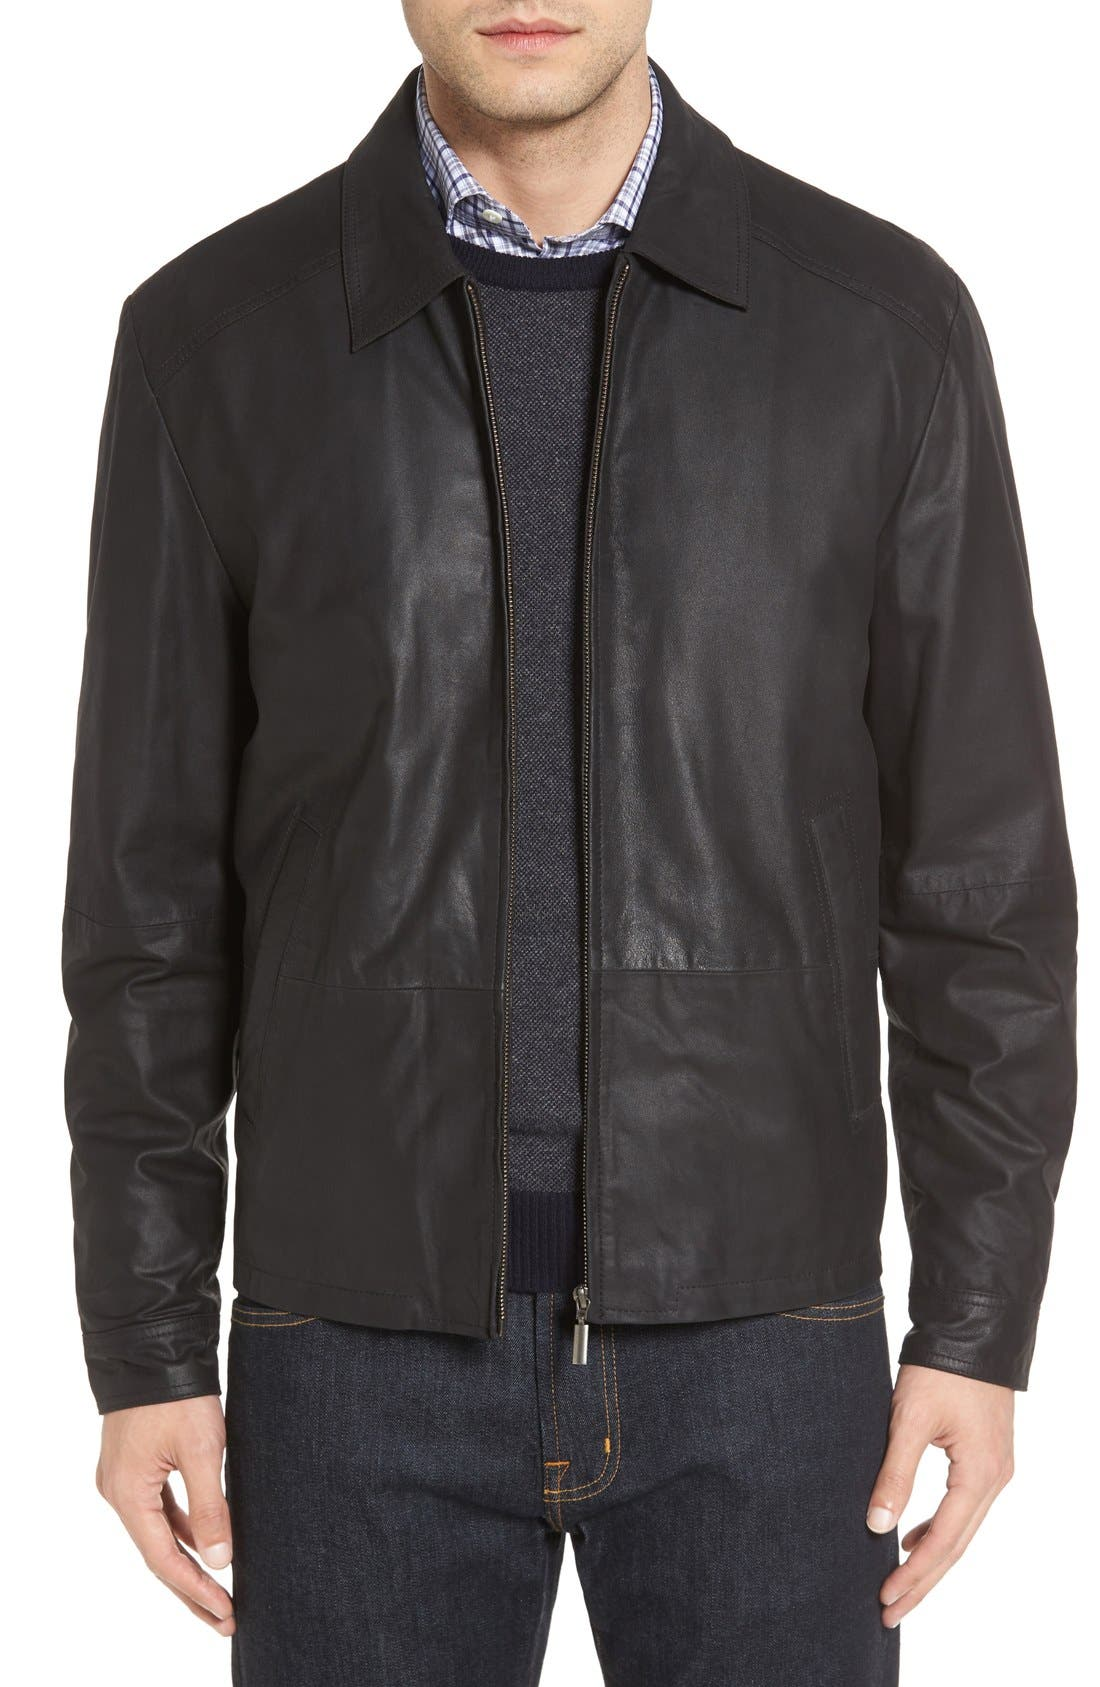 MissaniLe CollezioniLambskin Leather Jacket,                         Main,                         color, Black